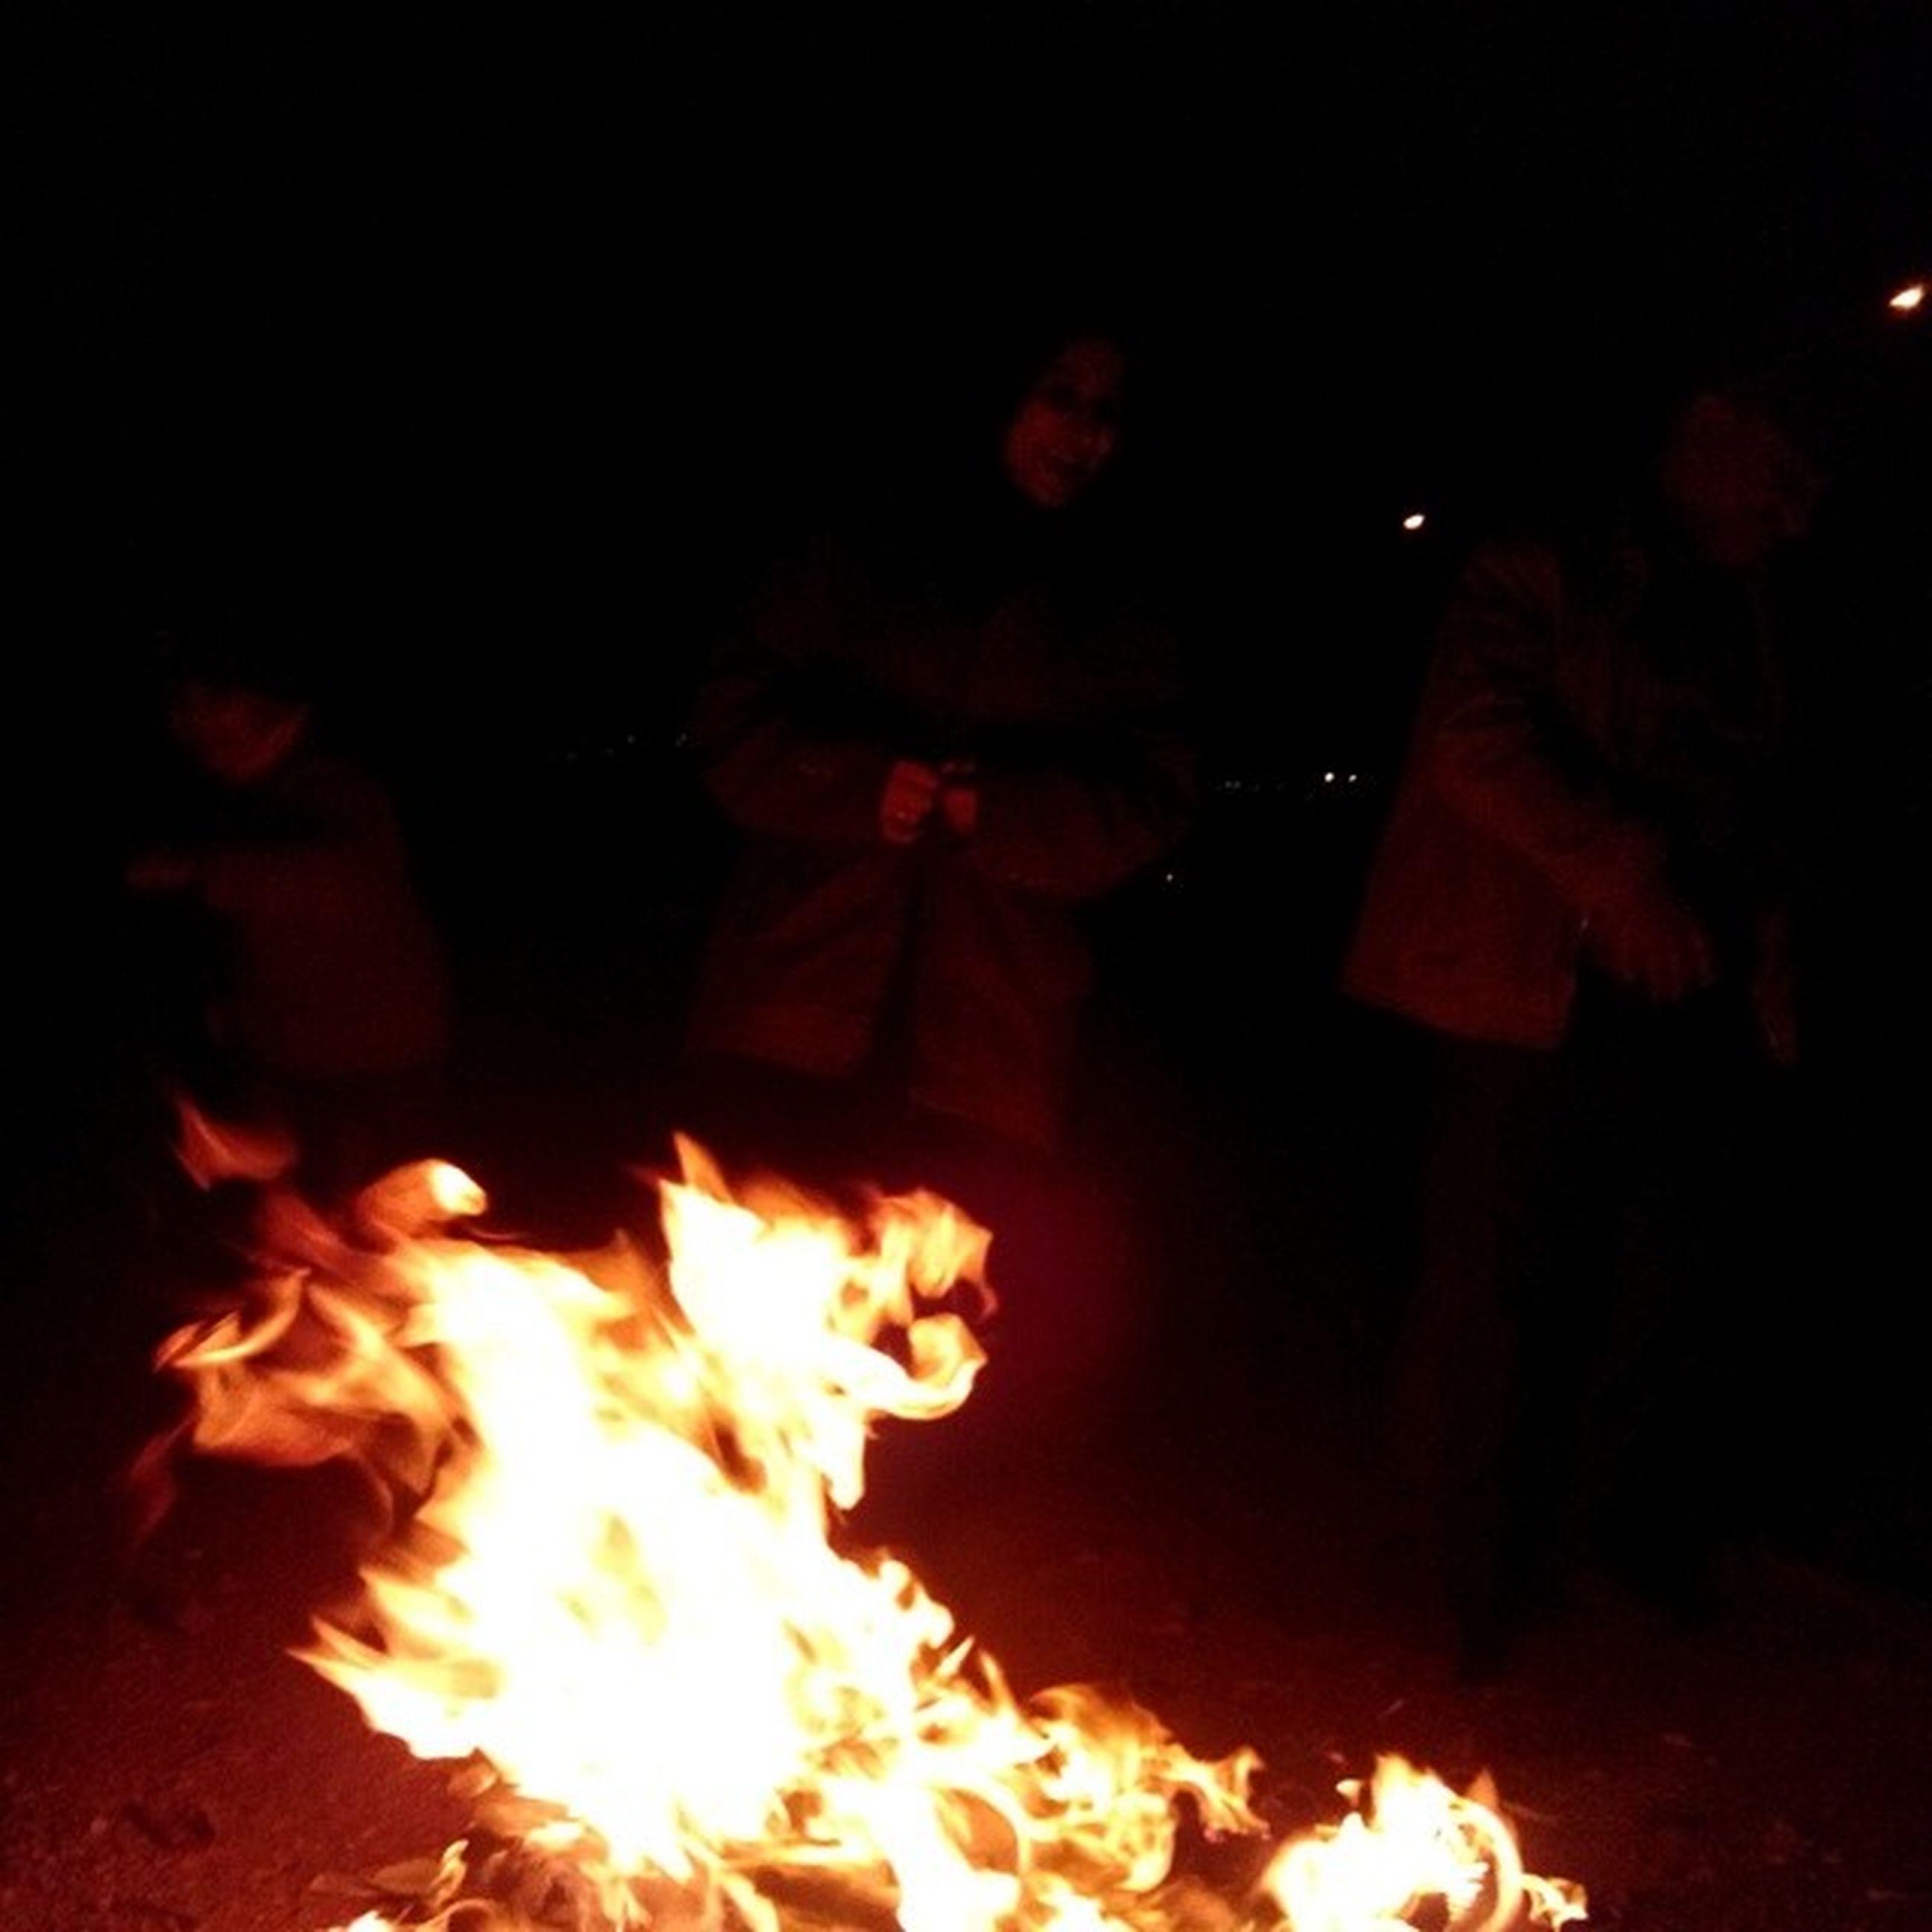 burning, flame, fire - natural phenomenon, heat - temperature, bonfire, night, fire, glowing, firewood, campfire, heat, illuminated, dark, light - natural phenomenon, orange color, fireplace, motion, smoke - physical structure, close-up, indoors